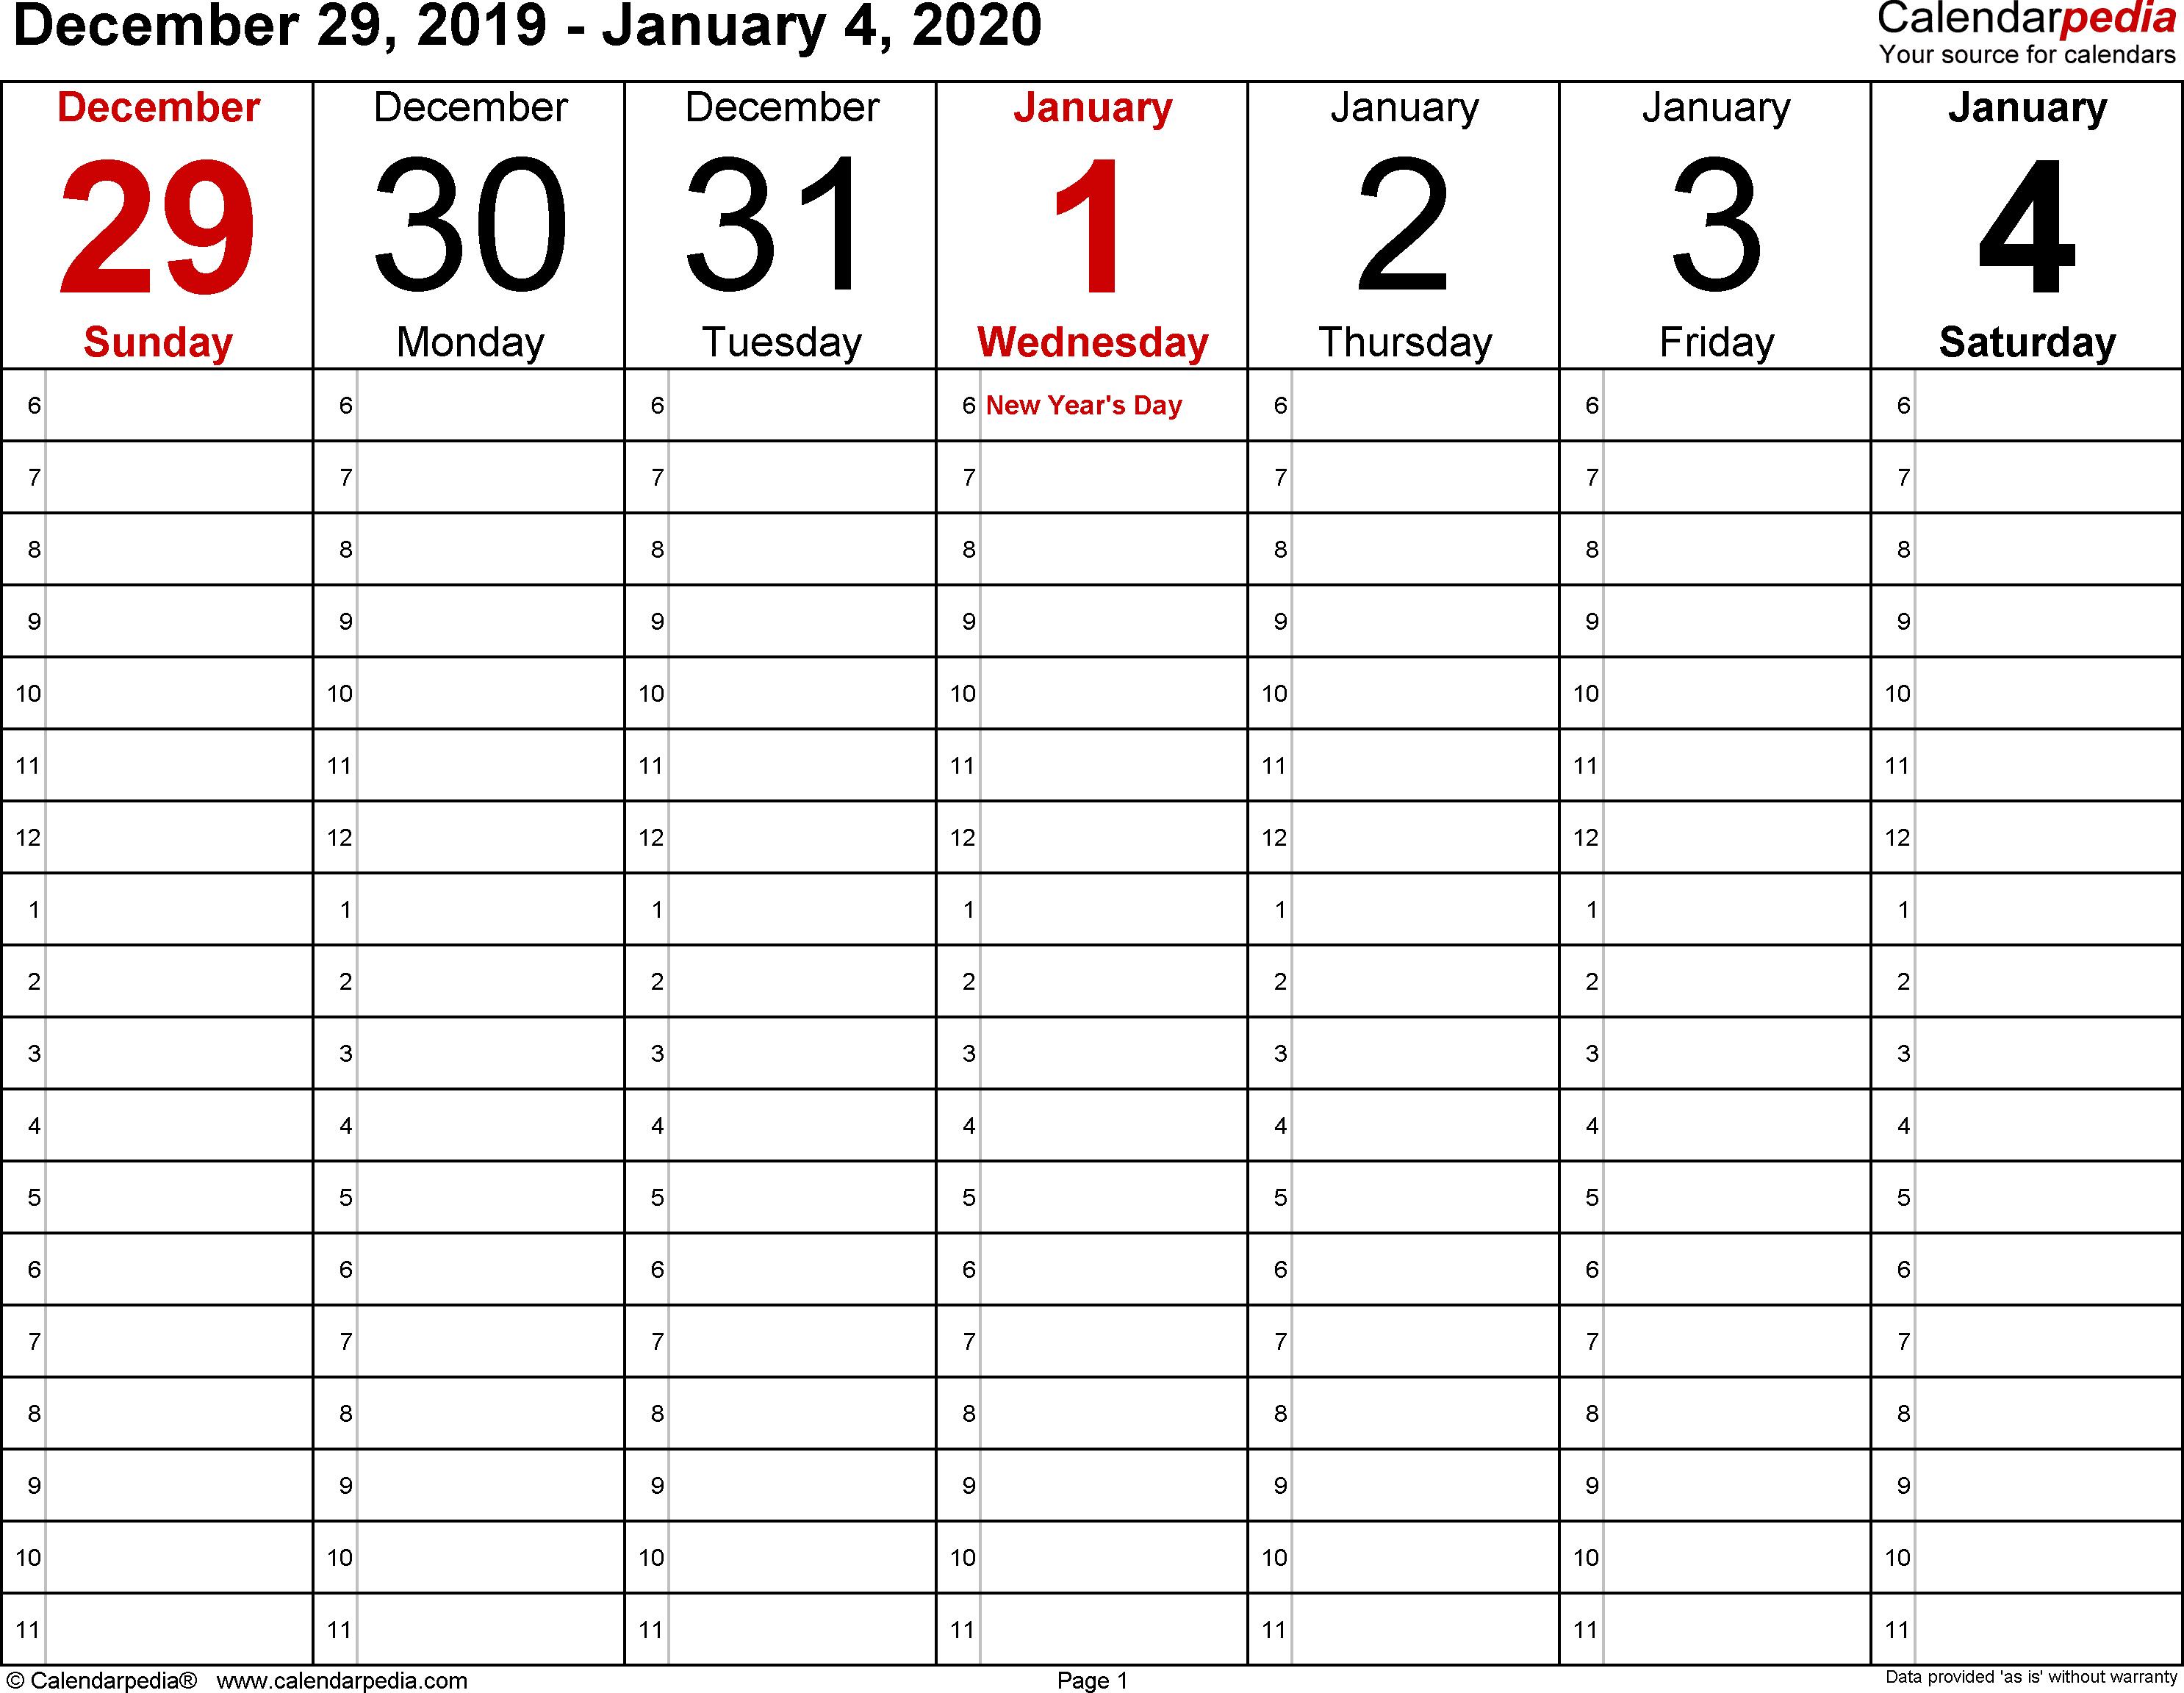 Weekly Calendar 2020 For Word - 12 Free Printable Templates with 2020 Free Printable Emploee Calendars